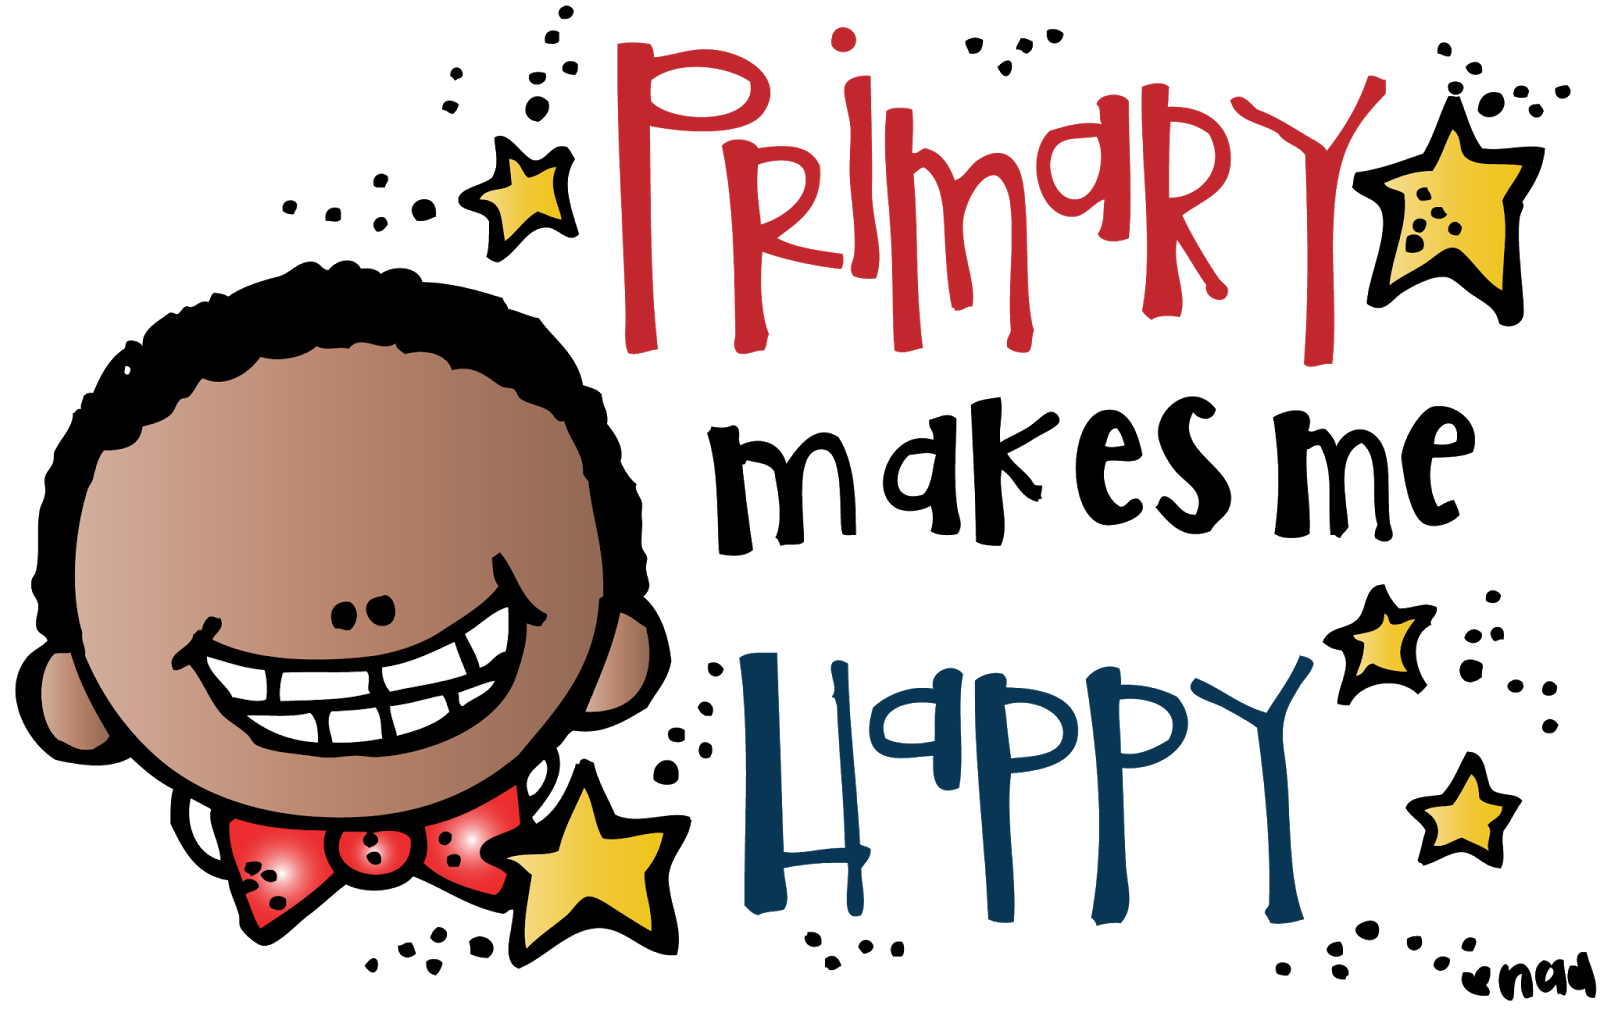 Proud clipart primary teacher, Proud primary teacher.